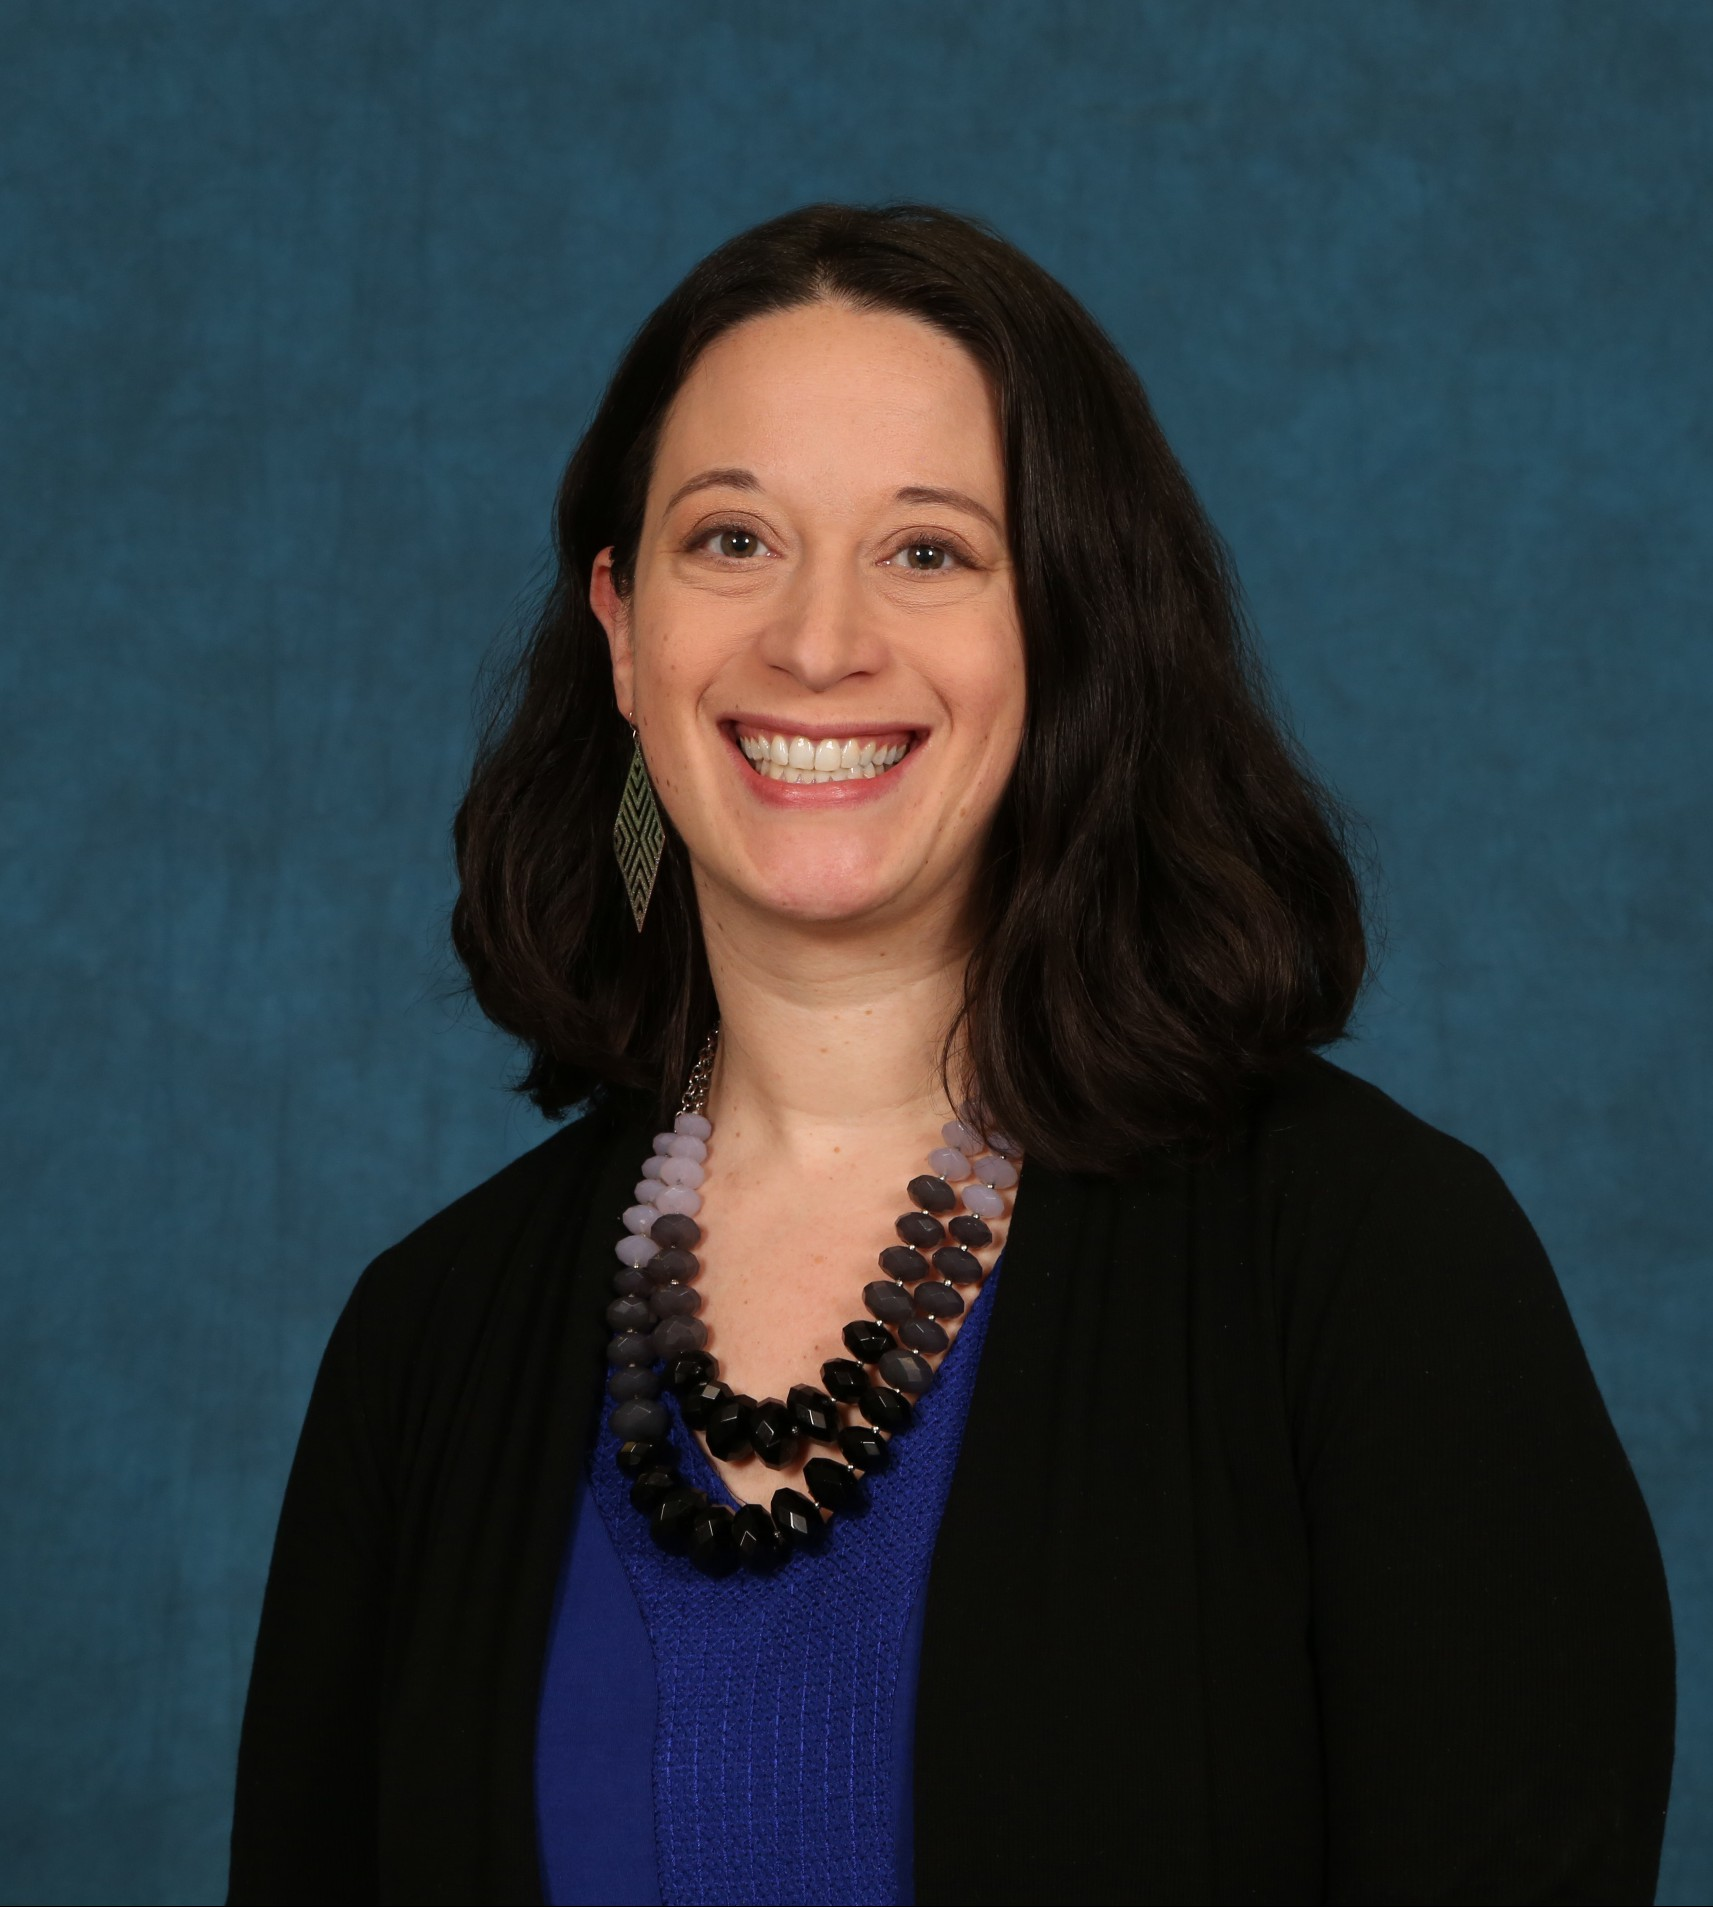 Janine Fisher